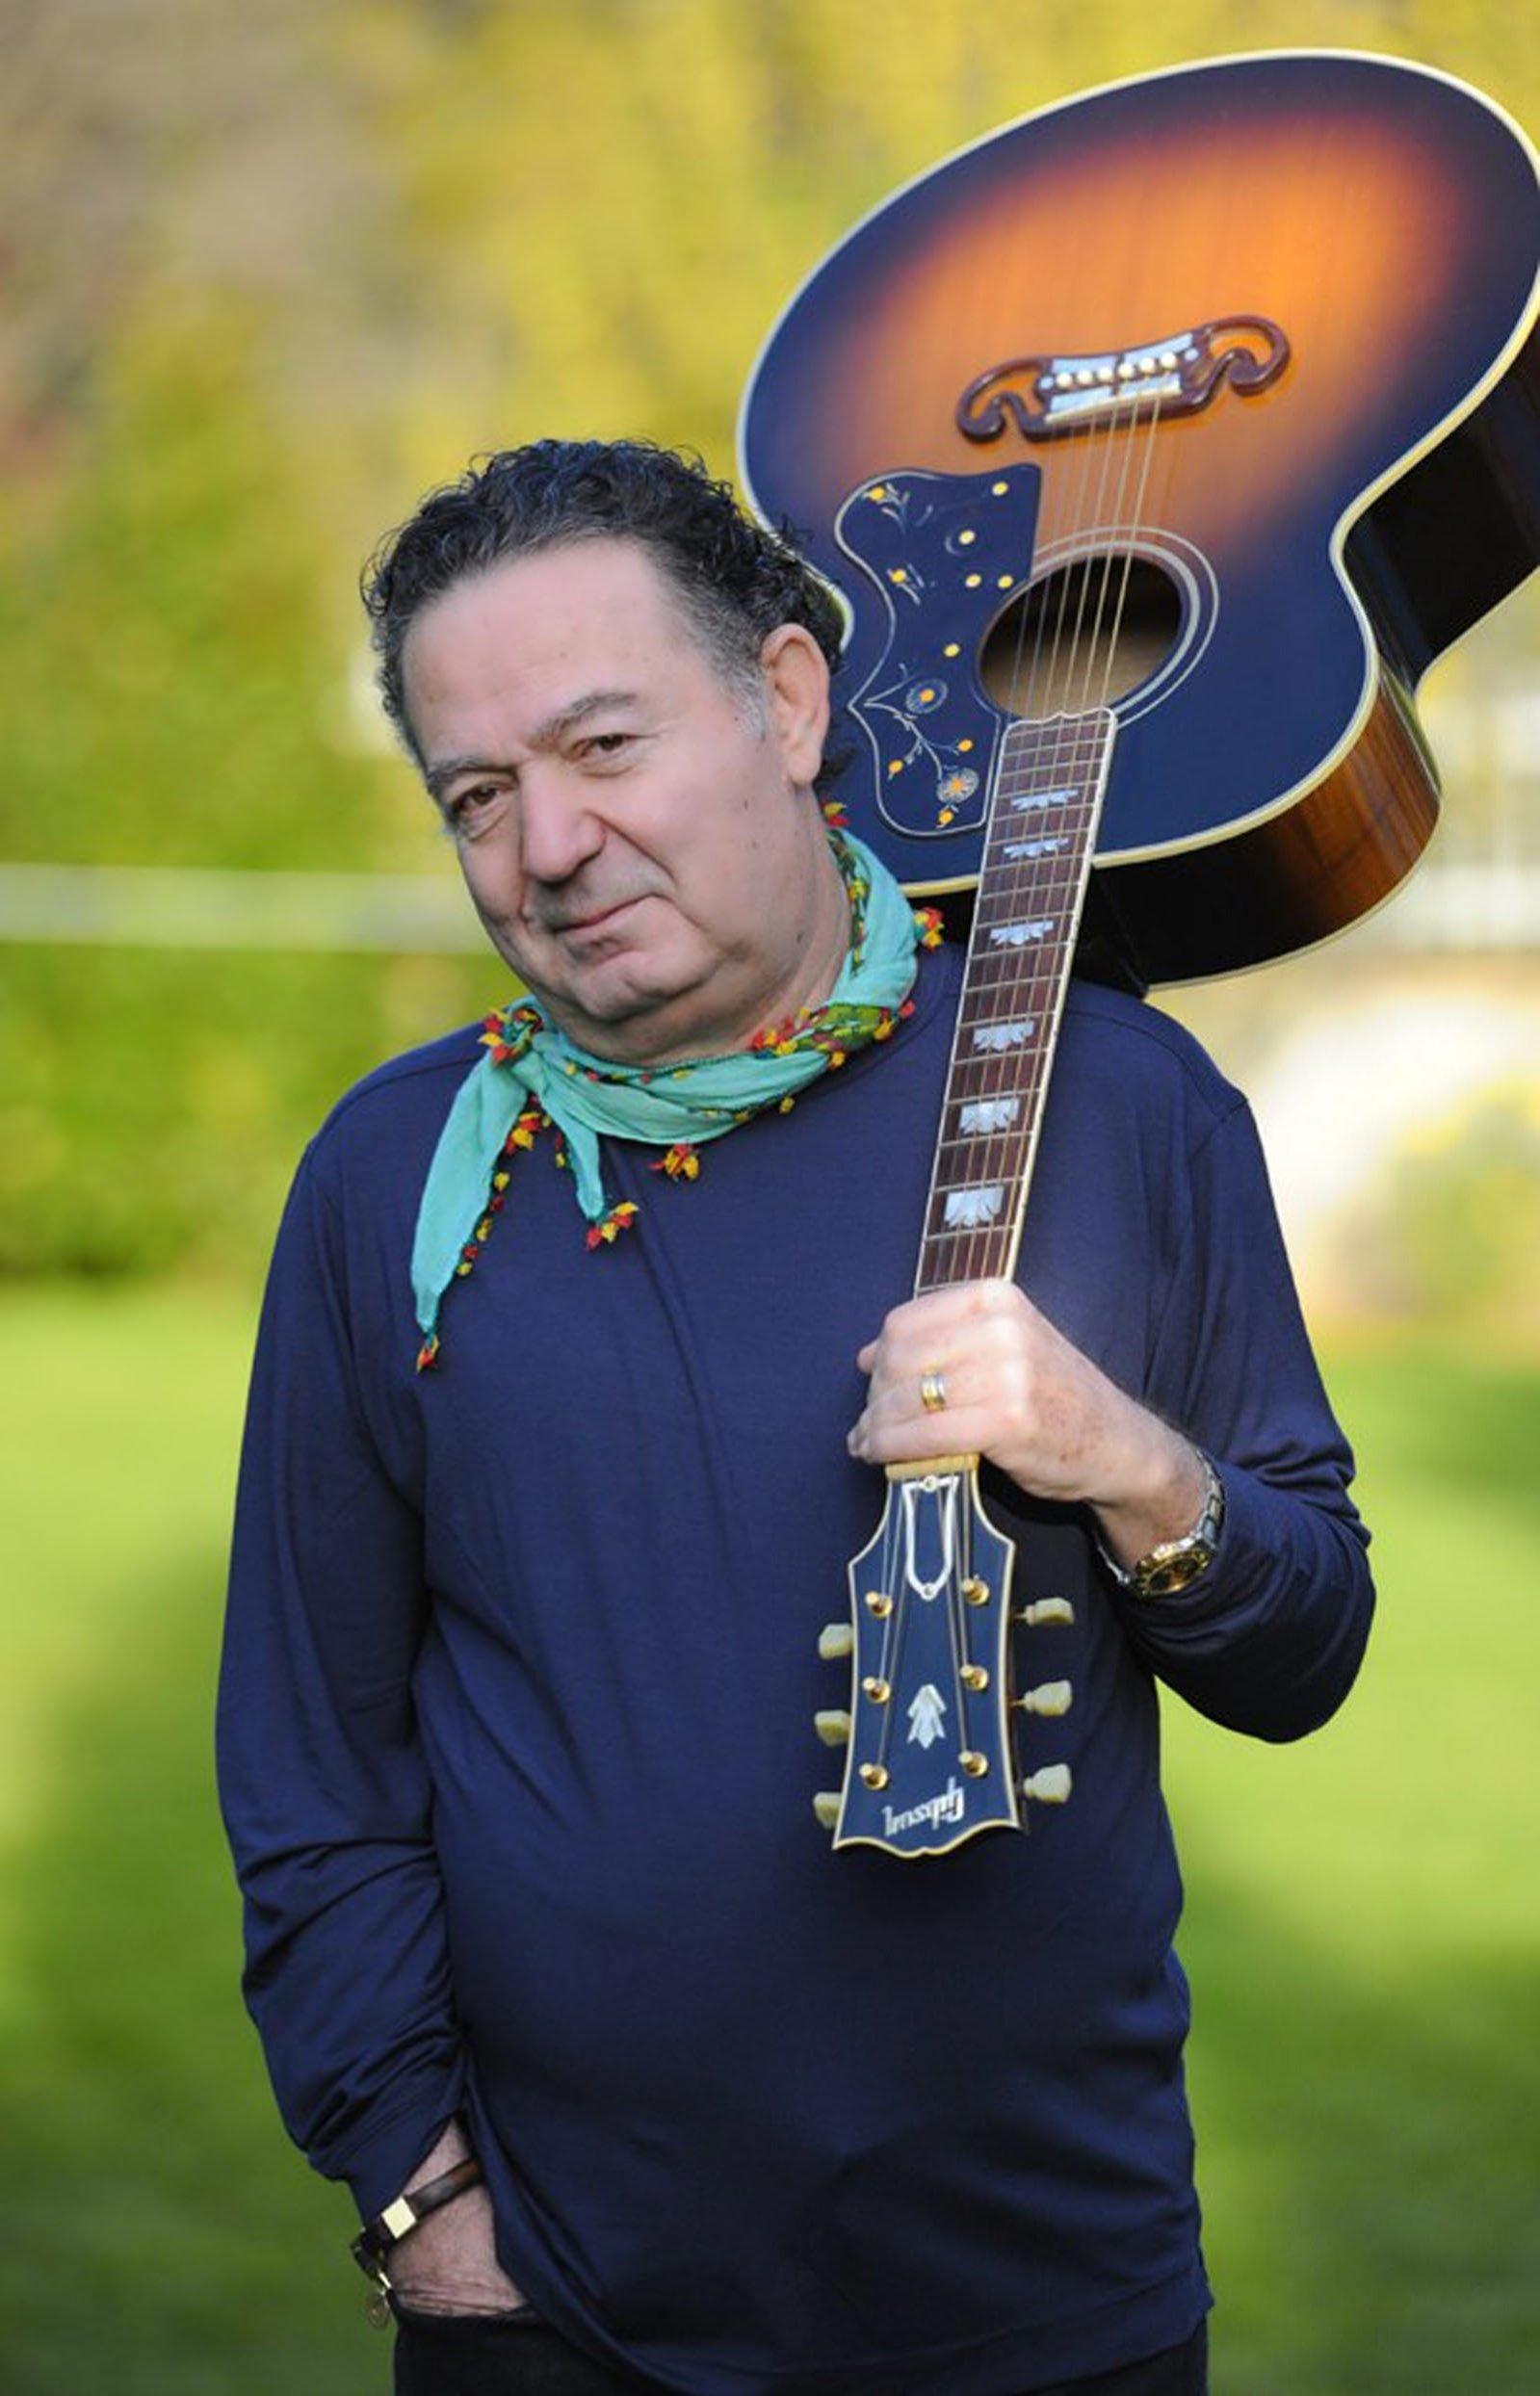 Turkish pop singer-songwriter Kayahan represented Turkey at Eurovision in 1990. (File Photo)